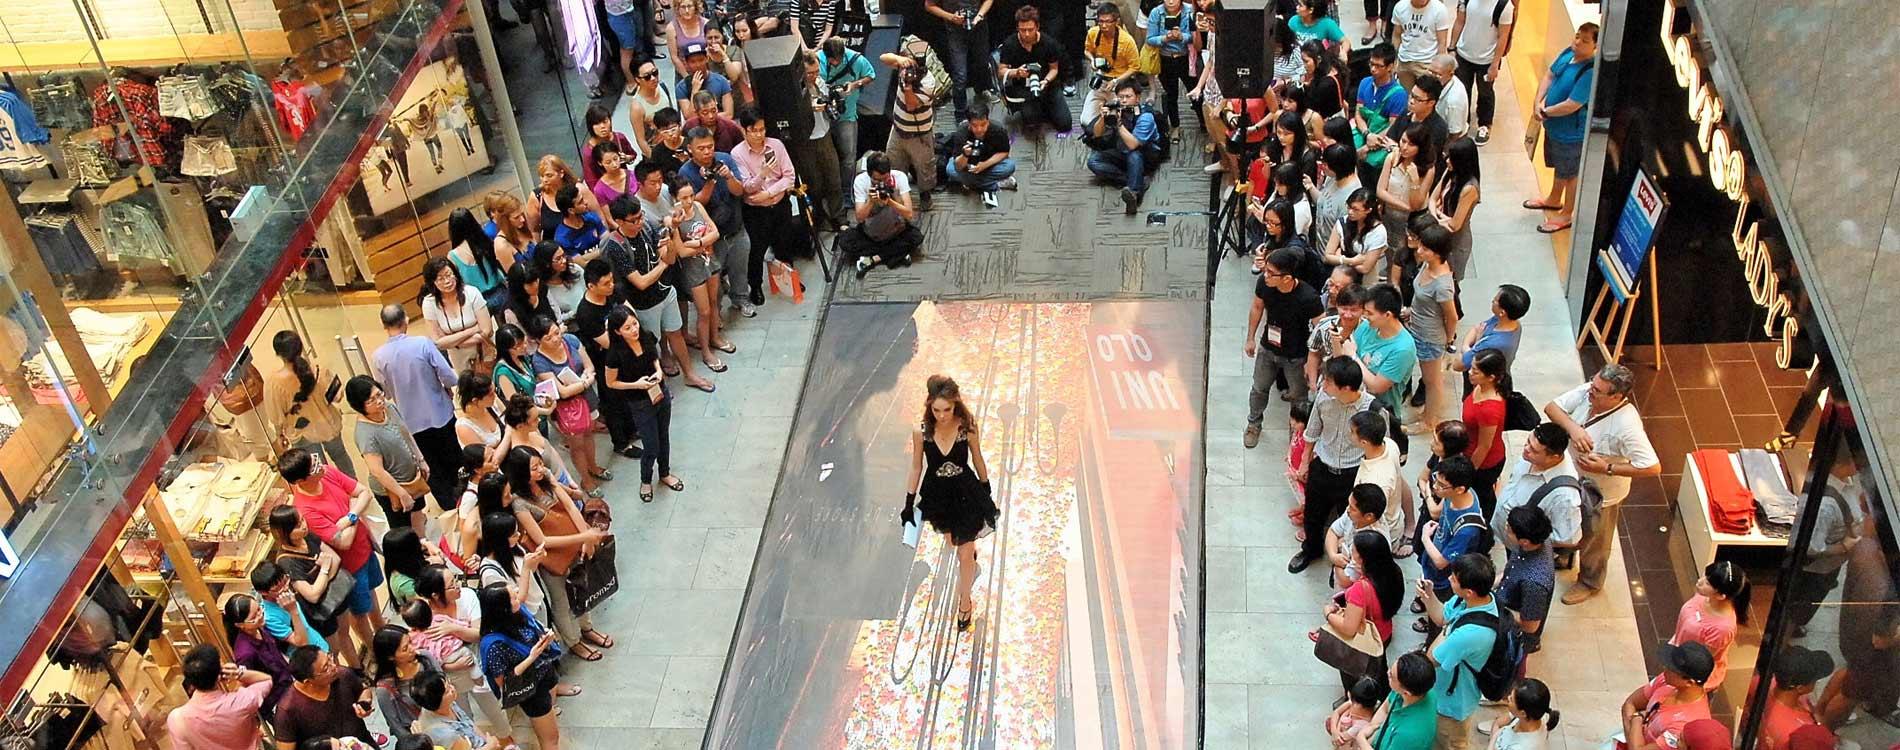 Singapore Events Management Company and Arts Fashion Music Singapore